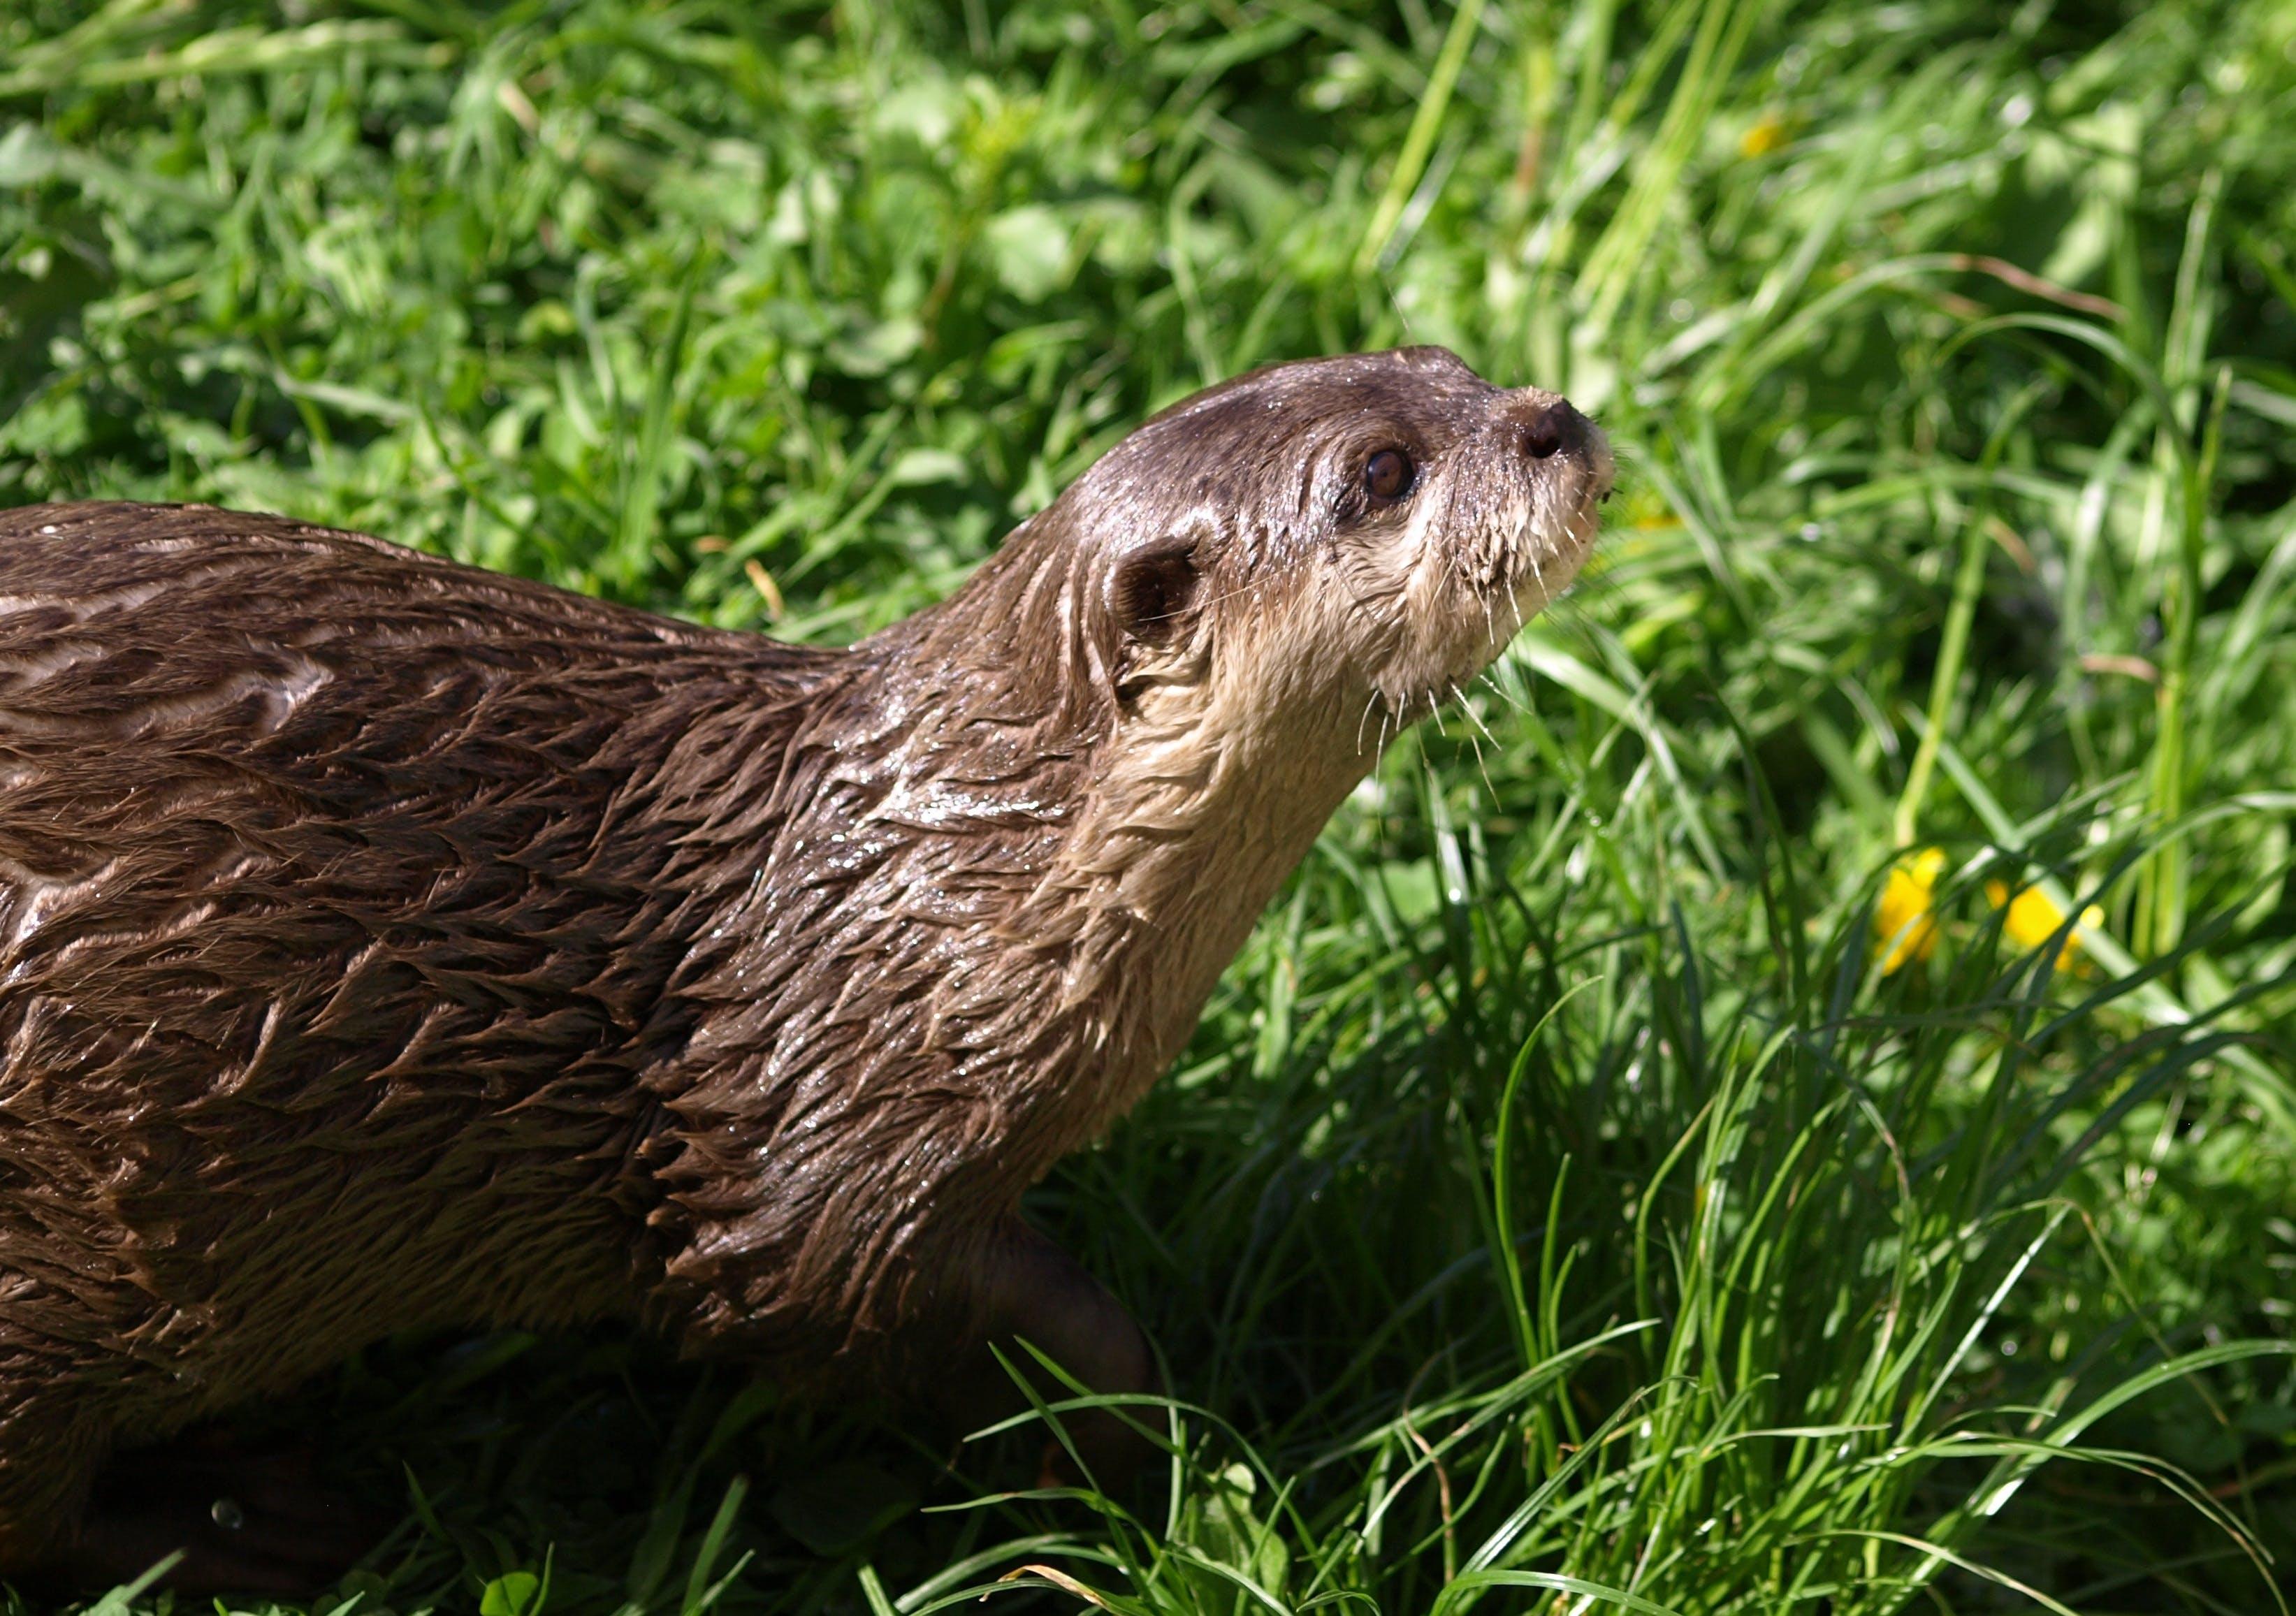 Brown Otter on Green Grass